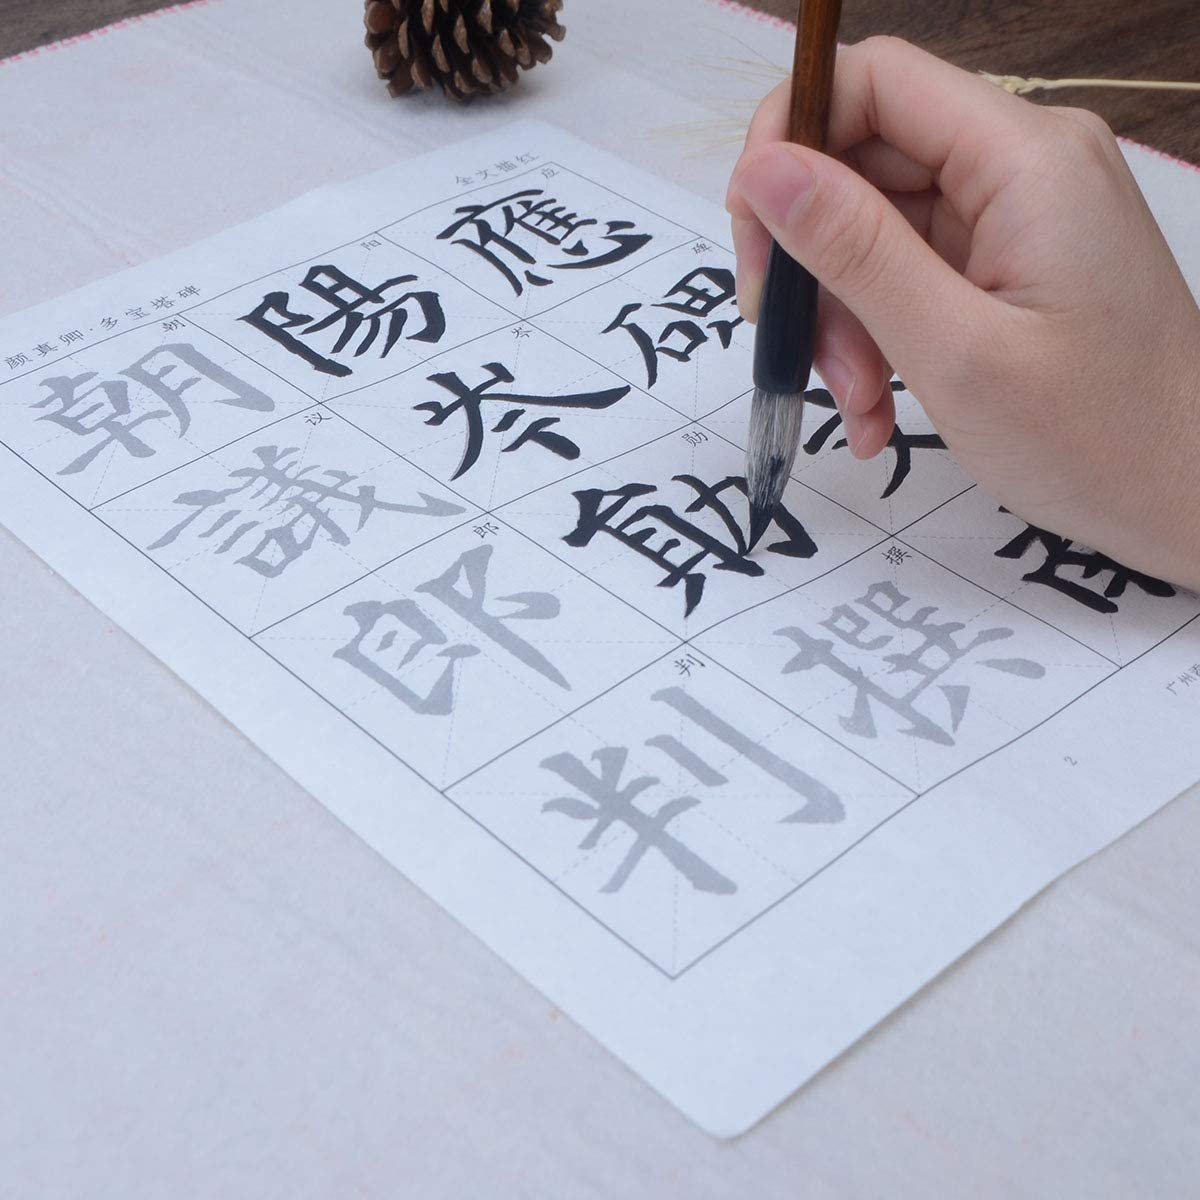 Tianjintang Chinese Calligraphy Big Grids Tracing Writing Xuan Paper Set for Beginners Kaishu 楷书 Chu Suiliang 褚遂良 Yan Tower 雁塔圣教序 122 Sheets